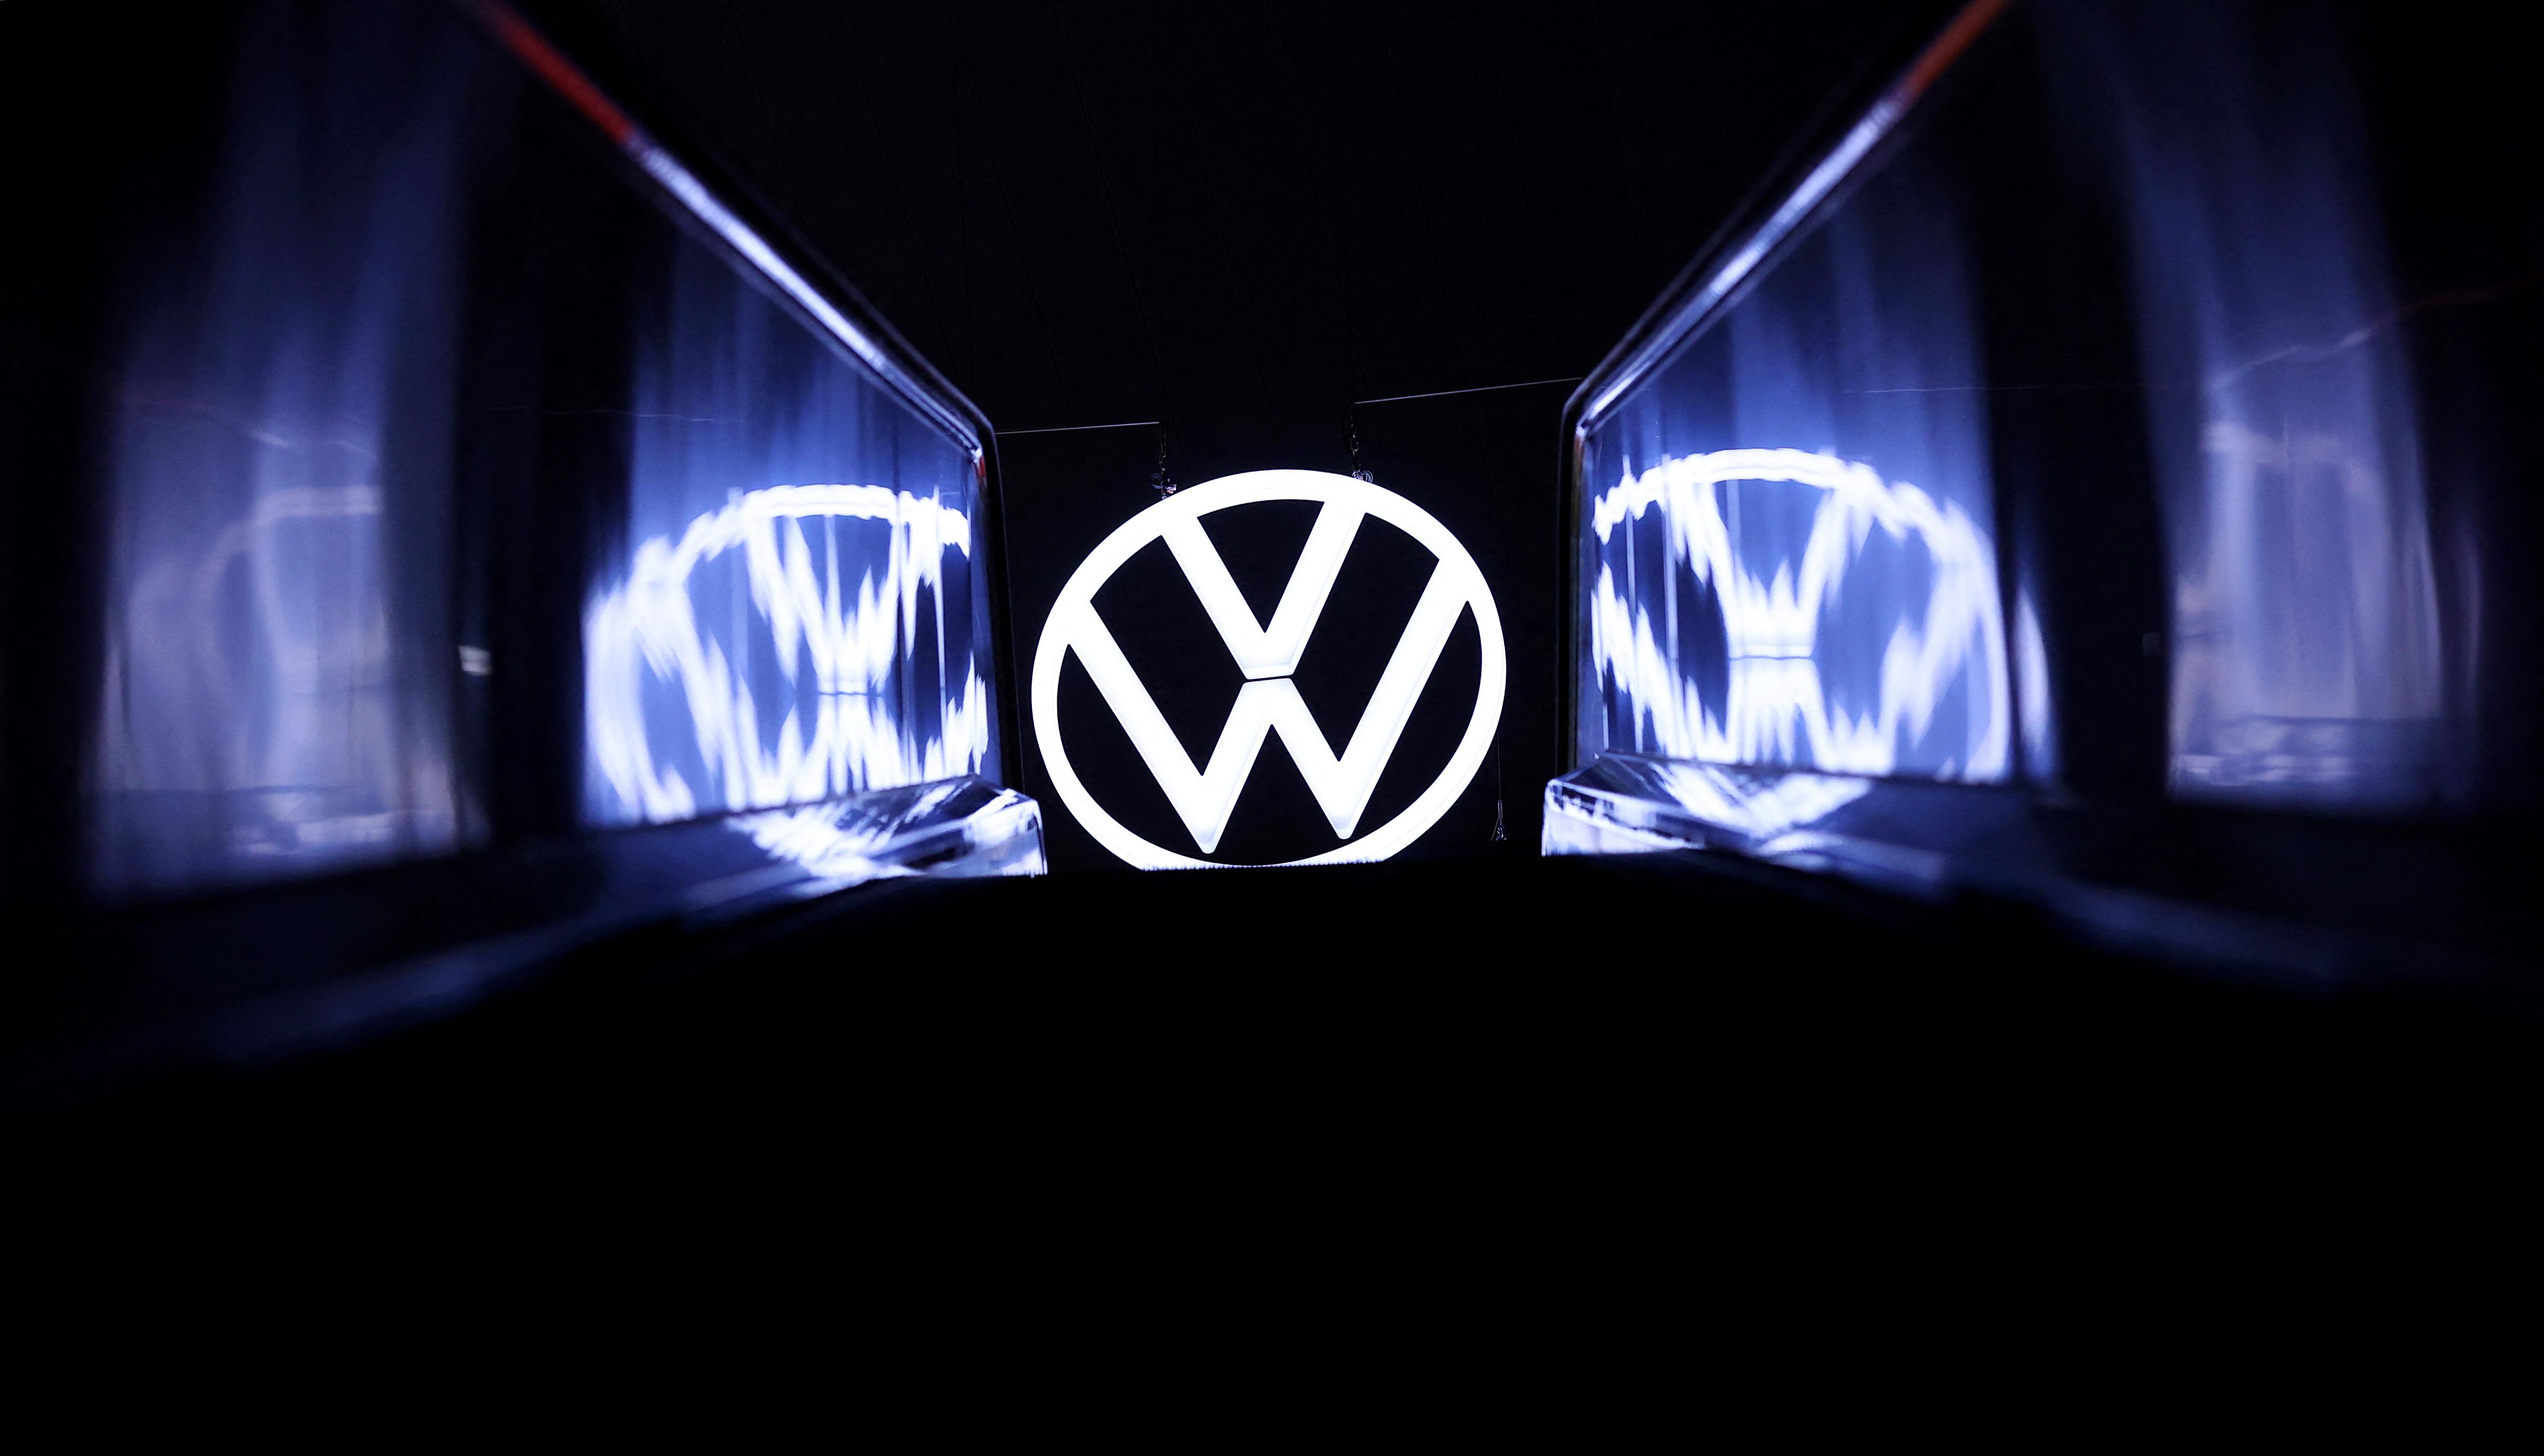 Carmaker Volkswagen announces plan to cut jobs: statement